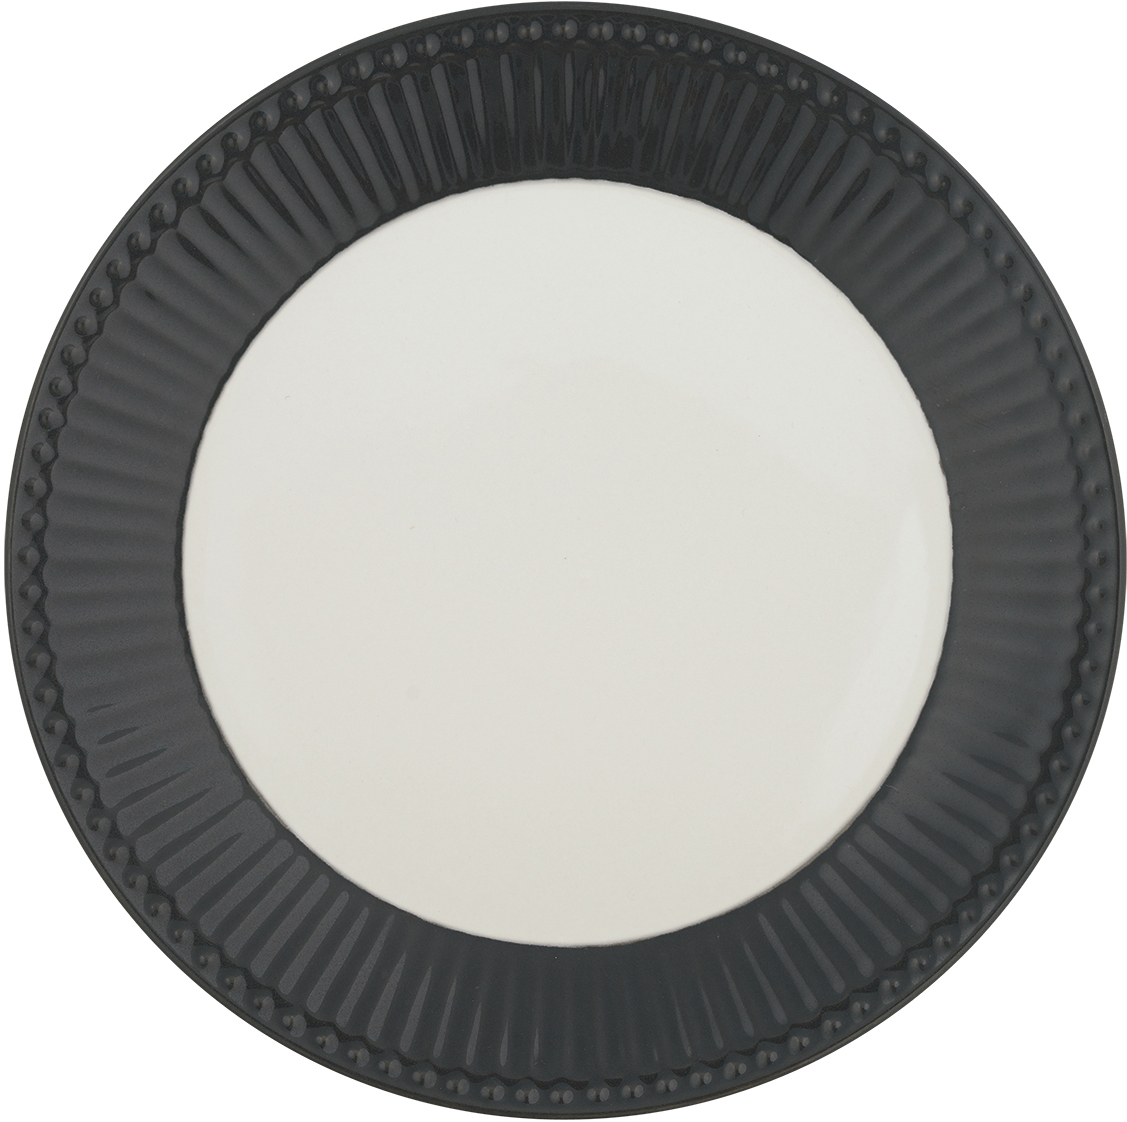 "Тарелка ""Alice"", цвет: серый, диаметр 23,5 см"